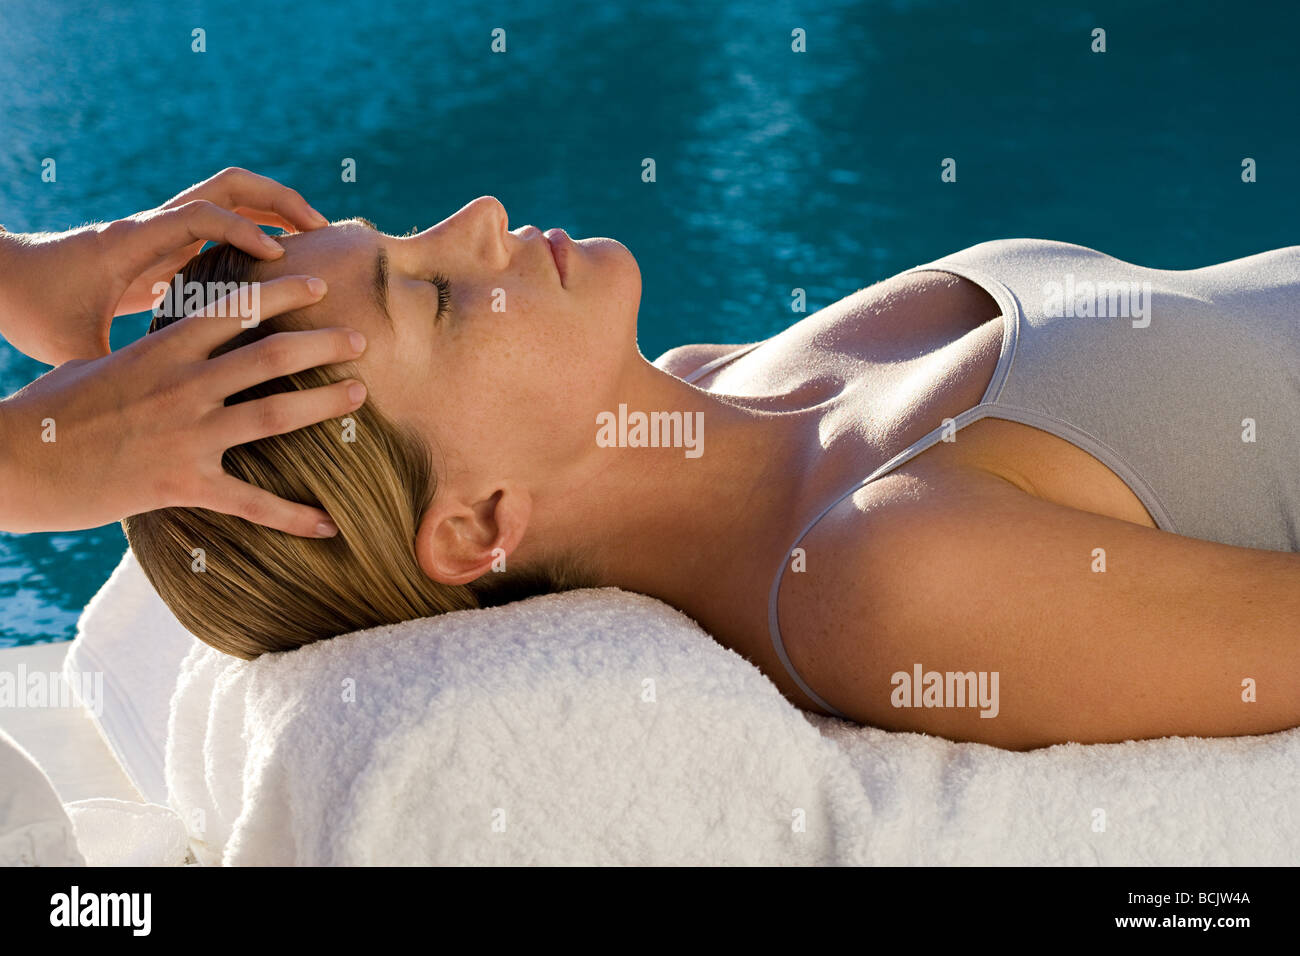 Young woman receiving facial massage - Stock Image